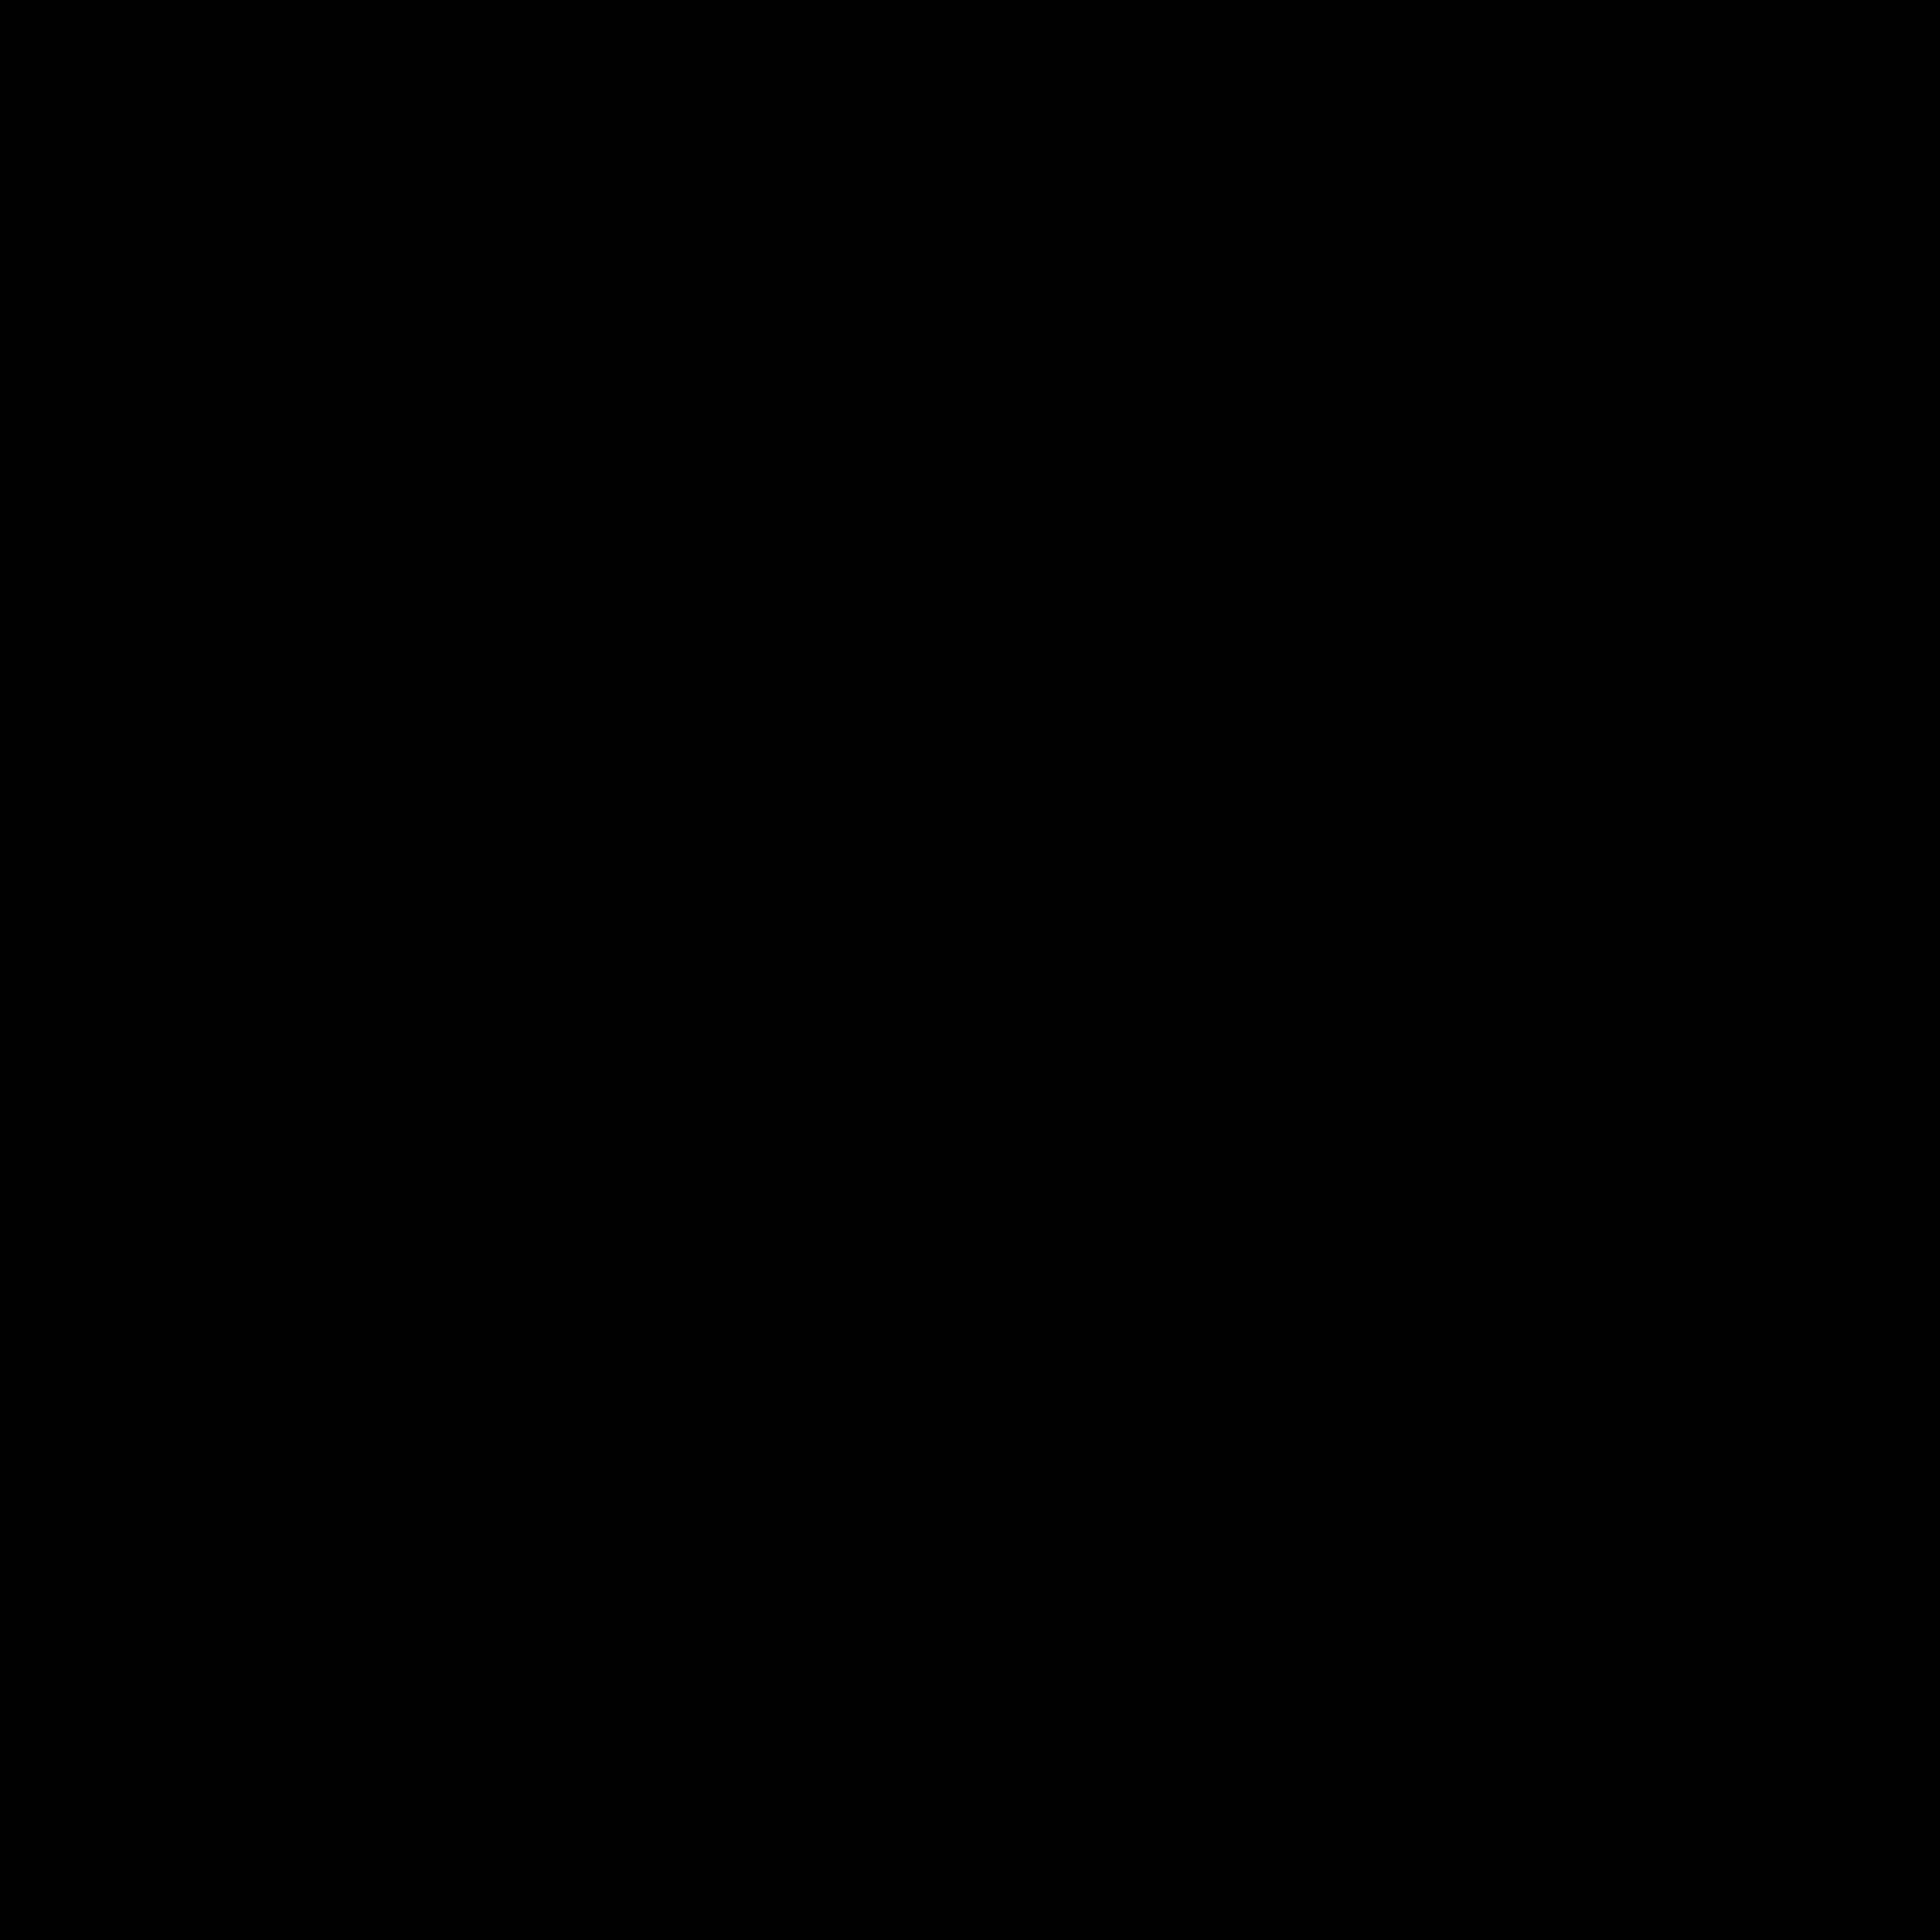 associated-press-01-logo-png-transparent.png